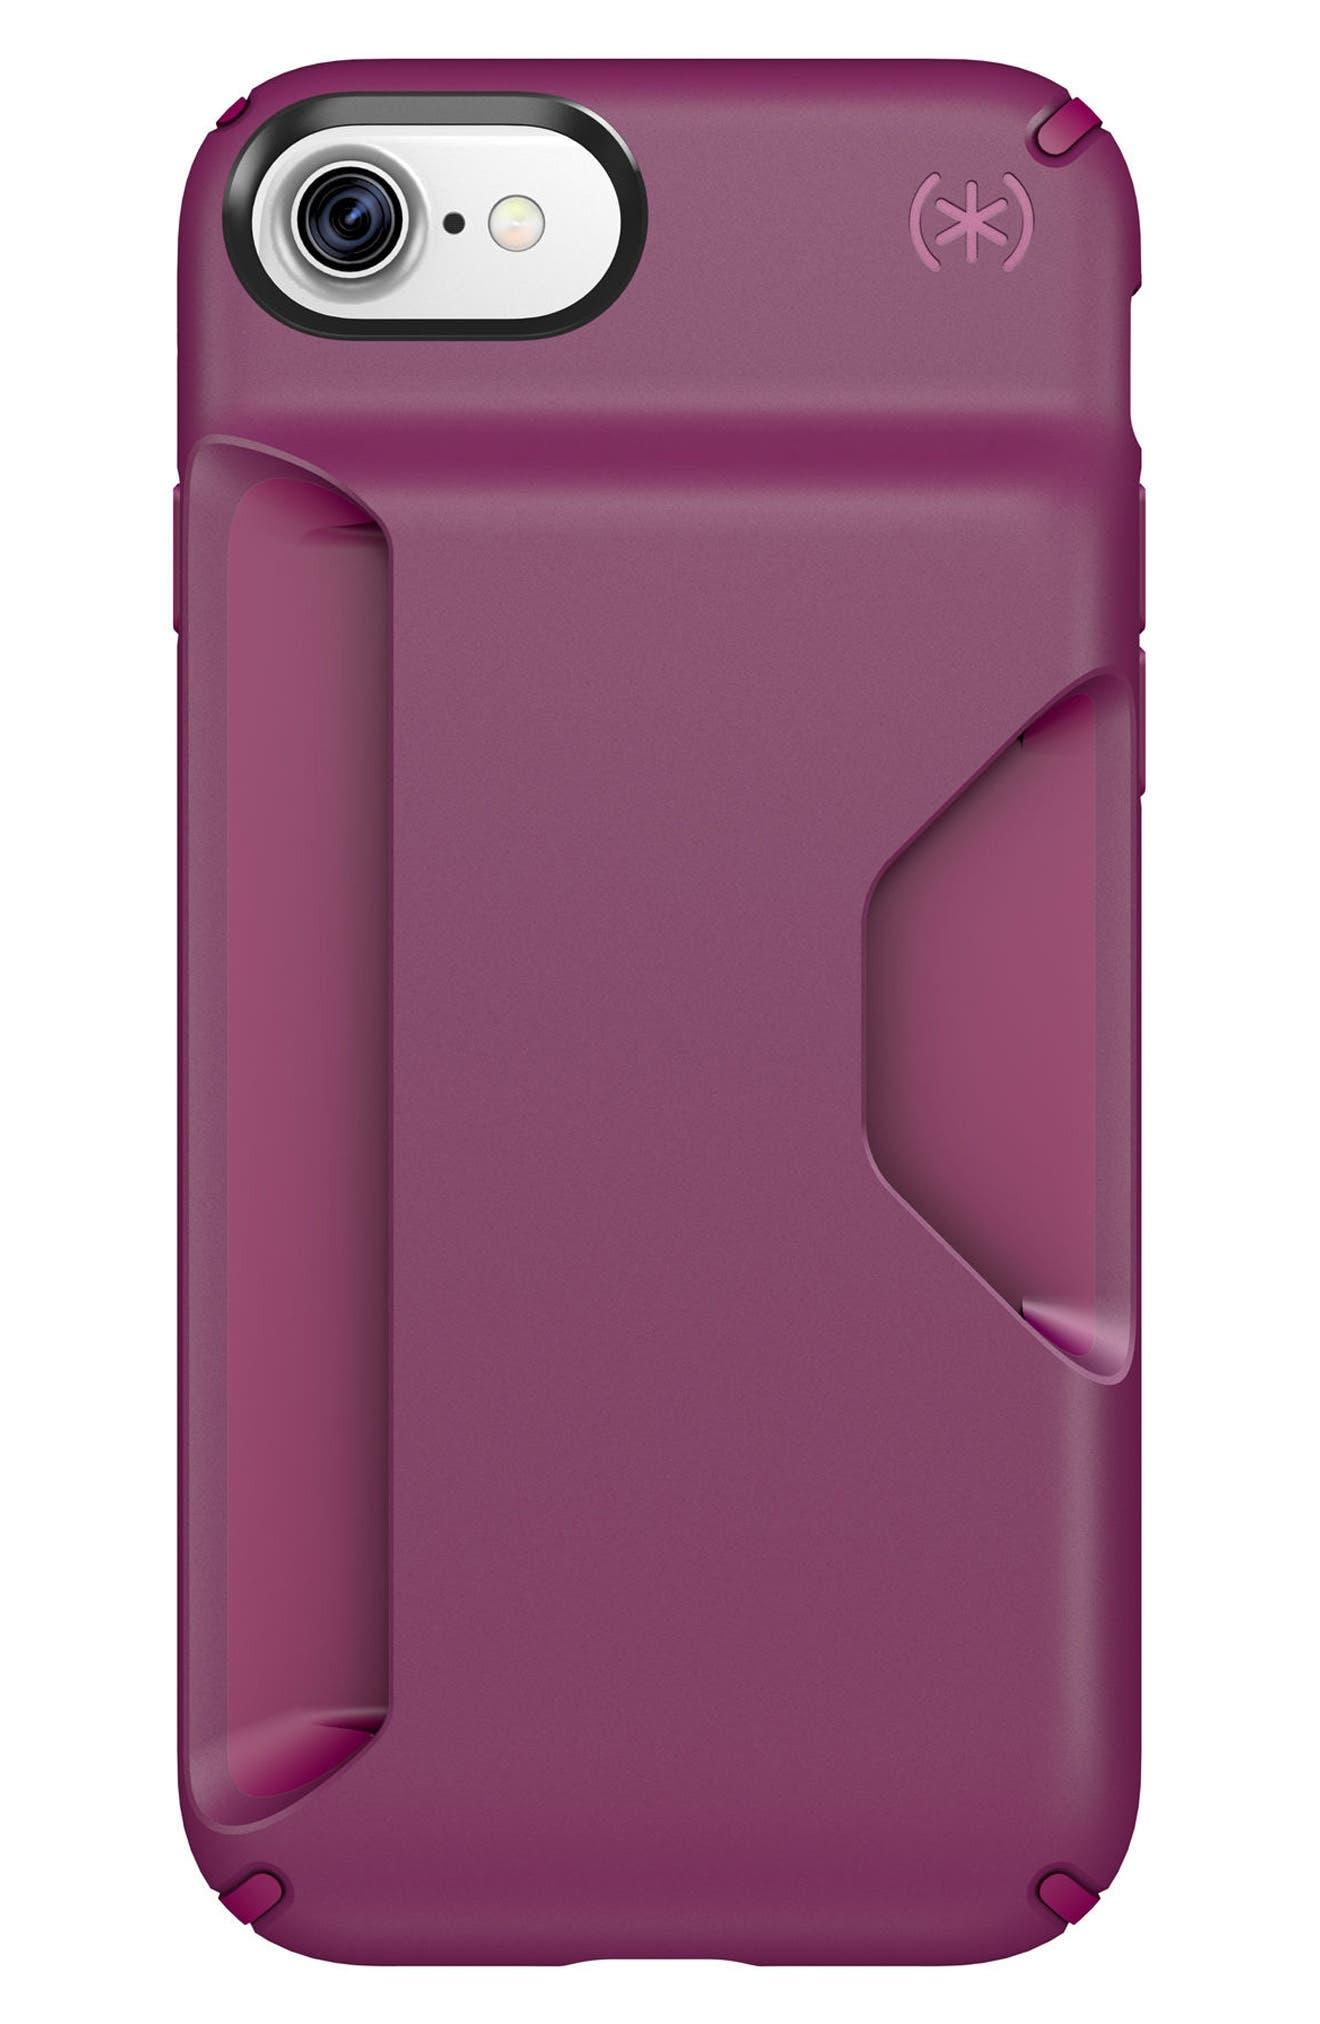 Alternate Image 1 Selected - Speck Presidio Wallet iPhone 6/6s/7/8 Plus Case